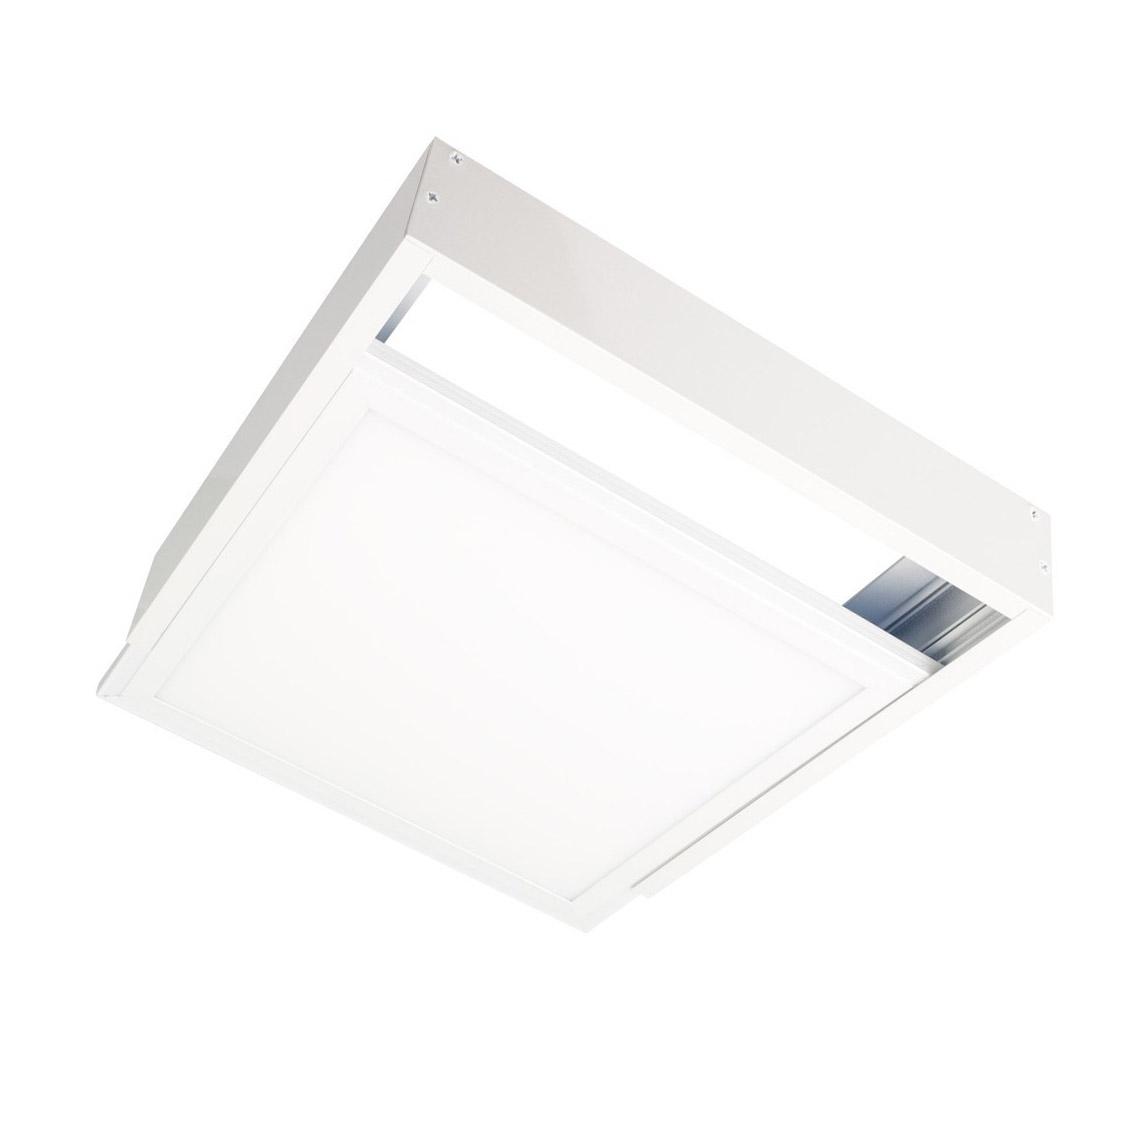 Kit moldura Branca para instalar Painel Led 60x60cm em superficie, Altura 68mm